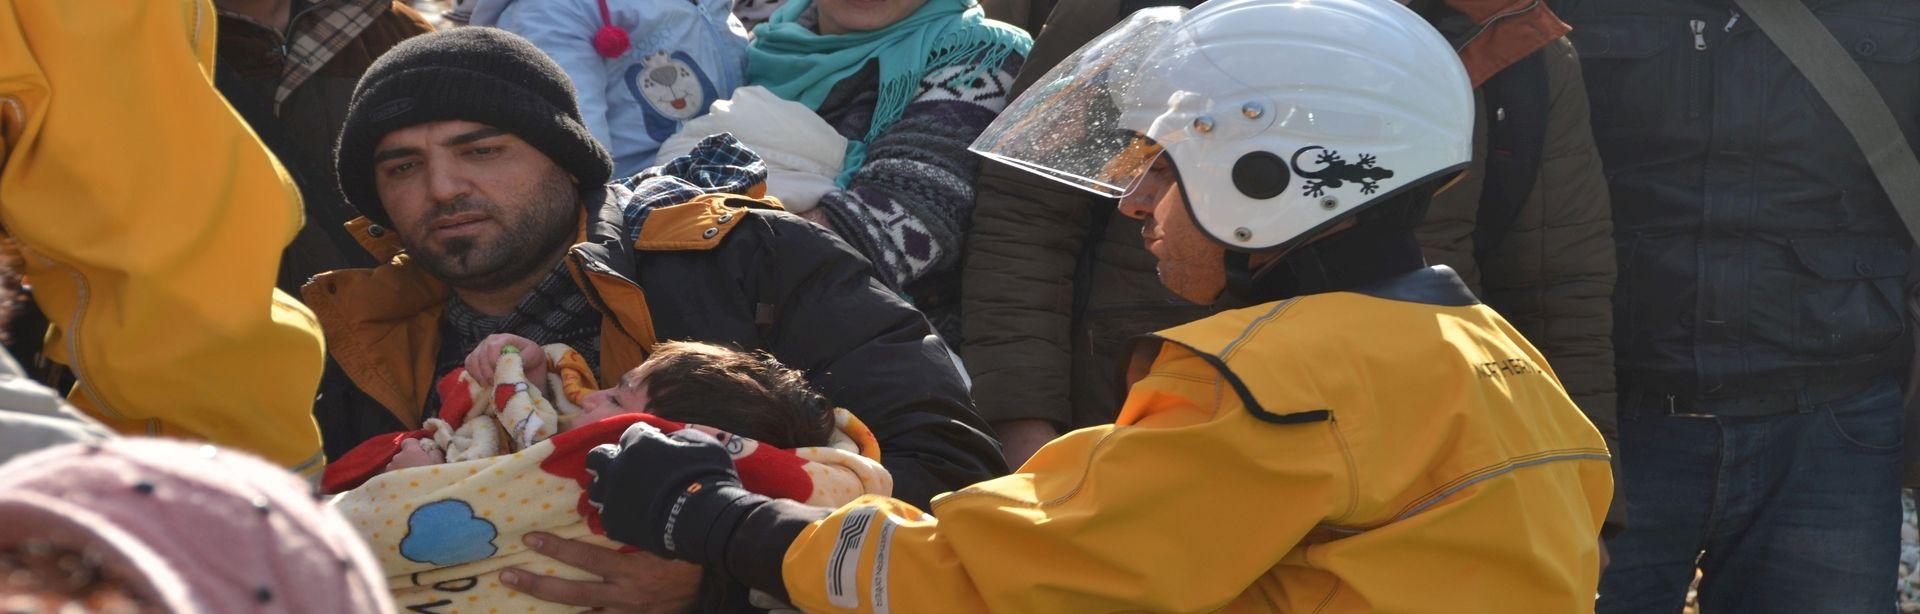 Samos  Foto: Hellenic Rescue Team